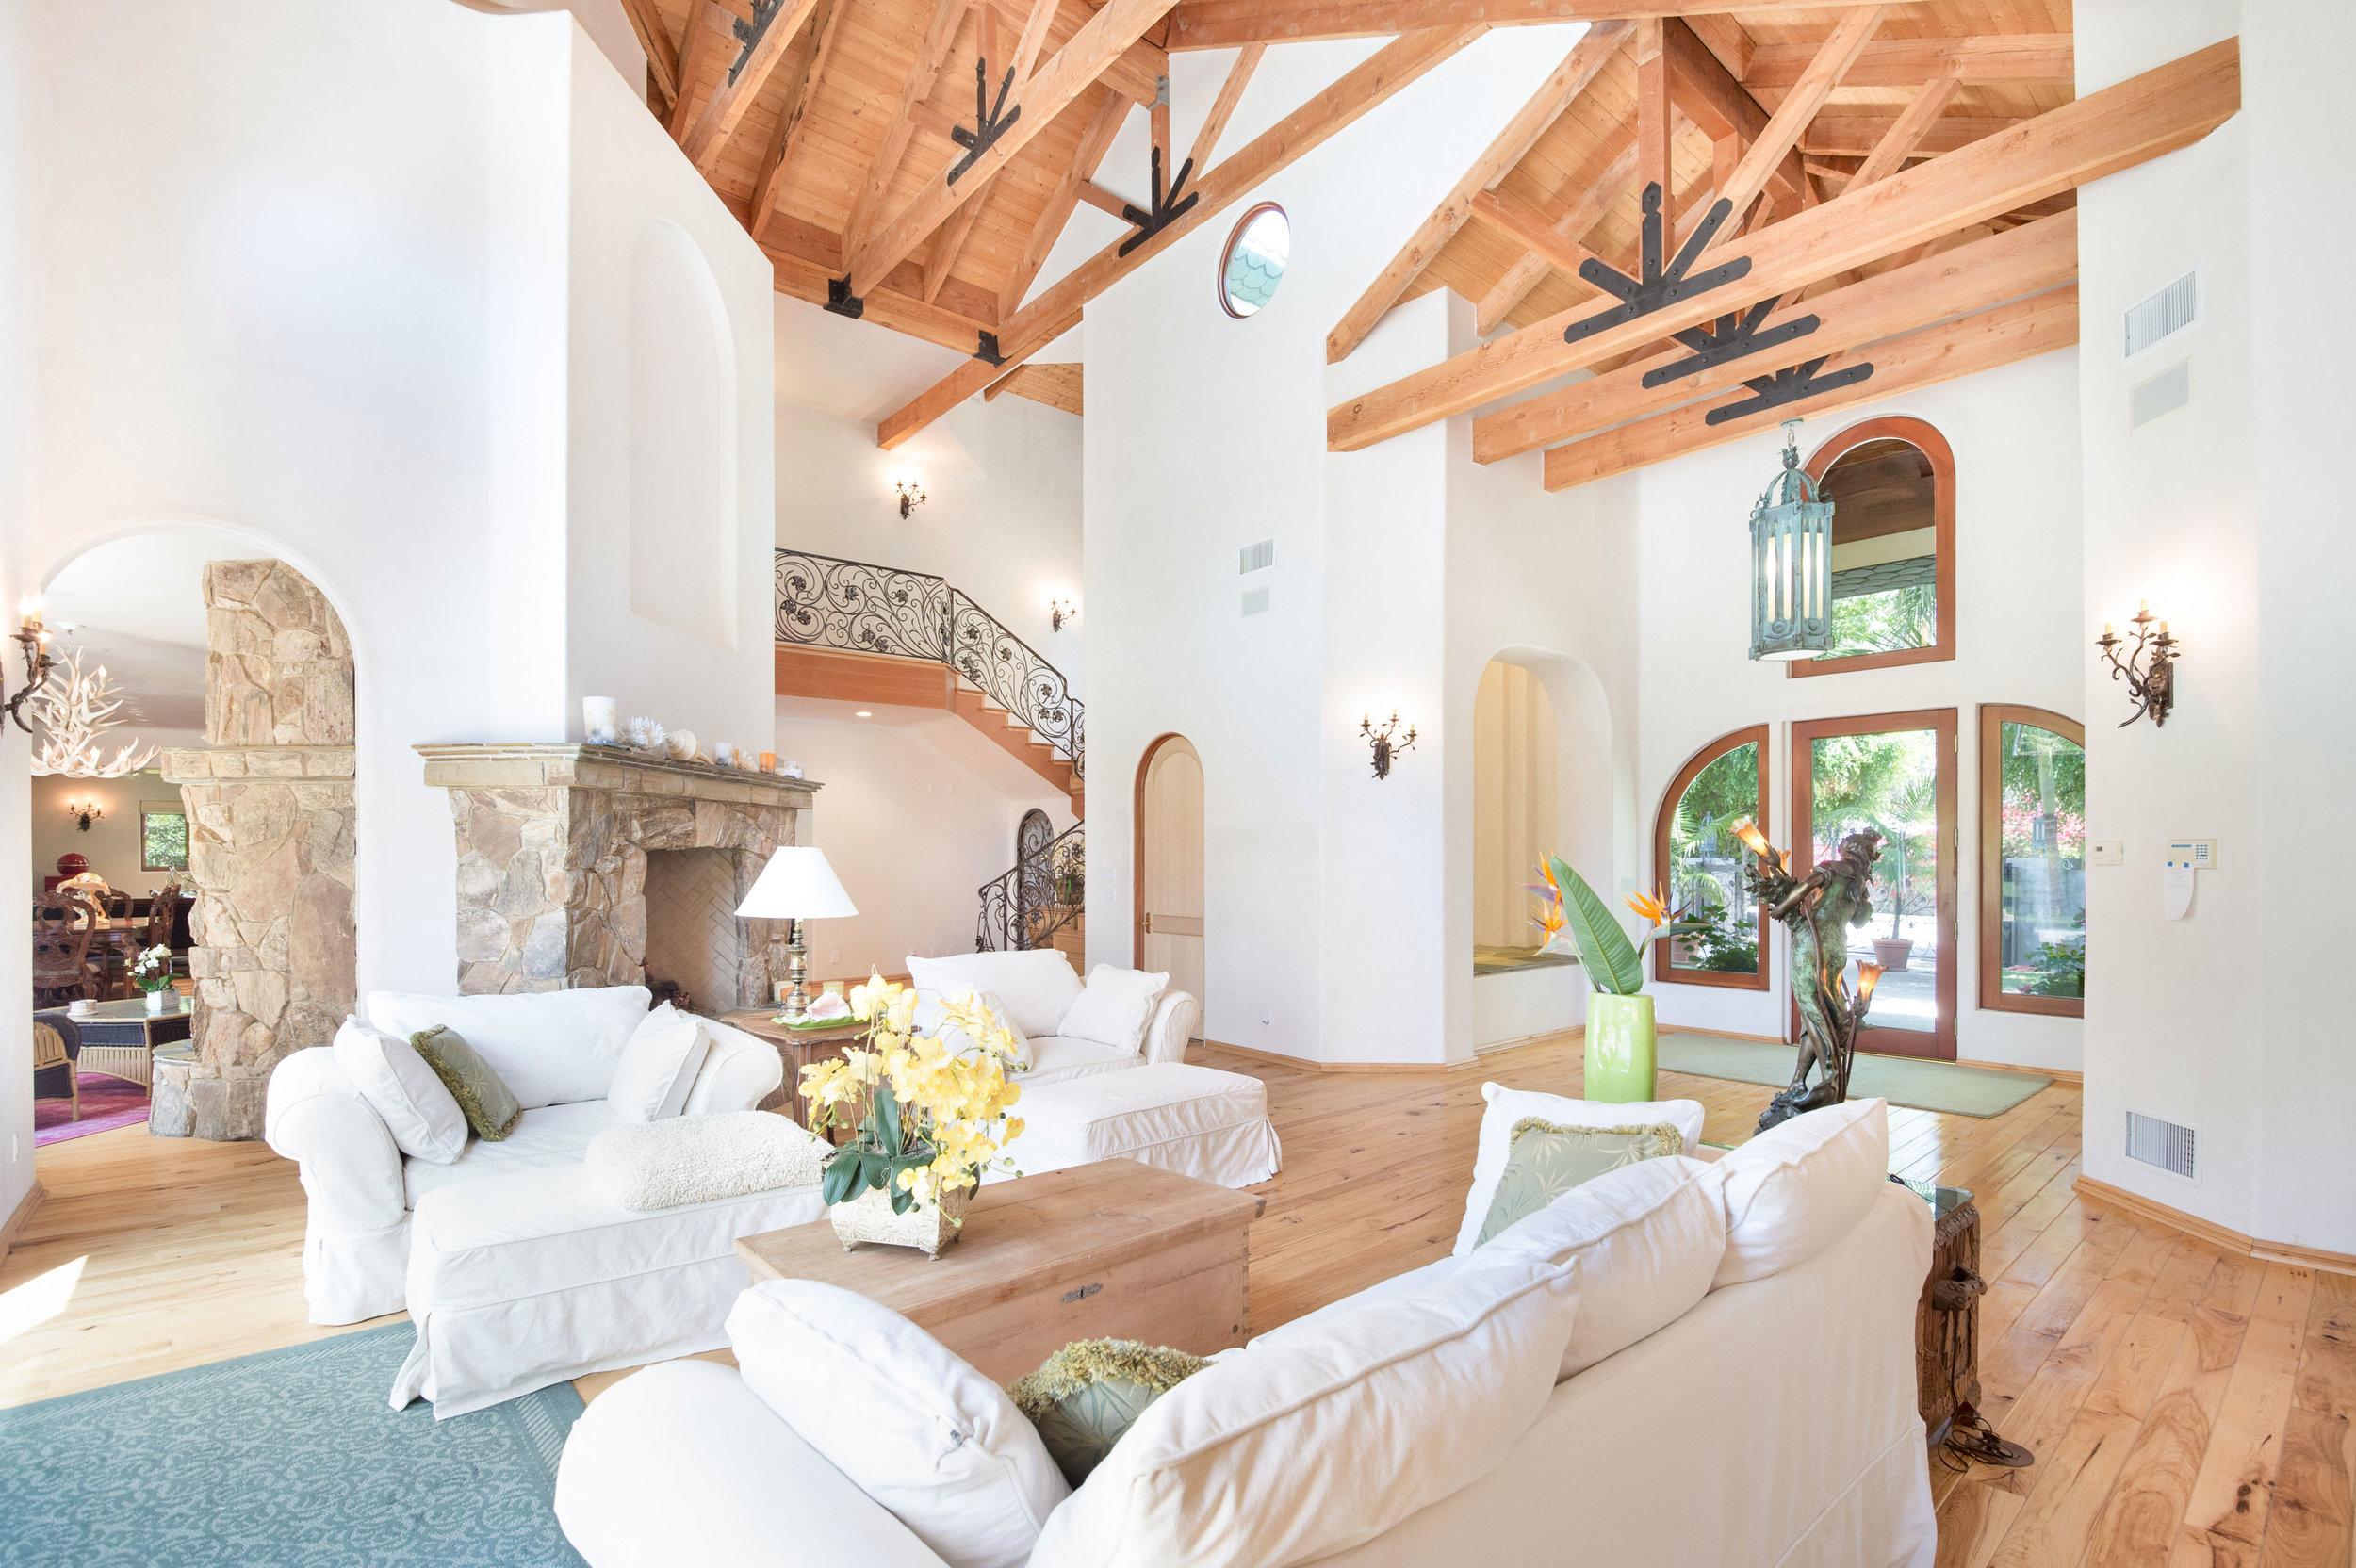 003 livingroom 6405 bonsall Malibu For Sale The Malibu Life Team Luxury Real Estate.jpg